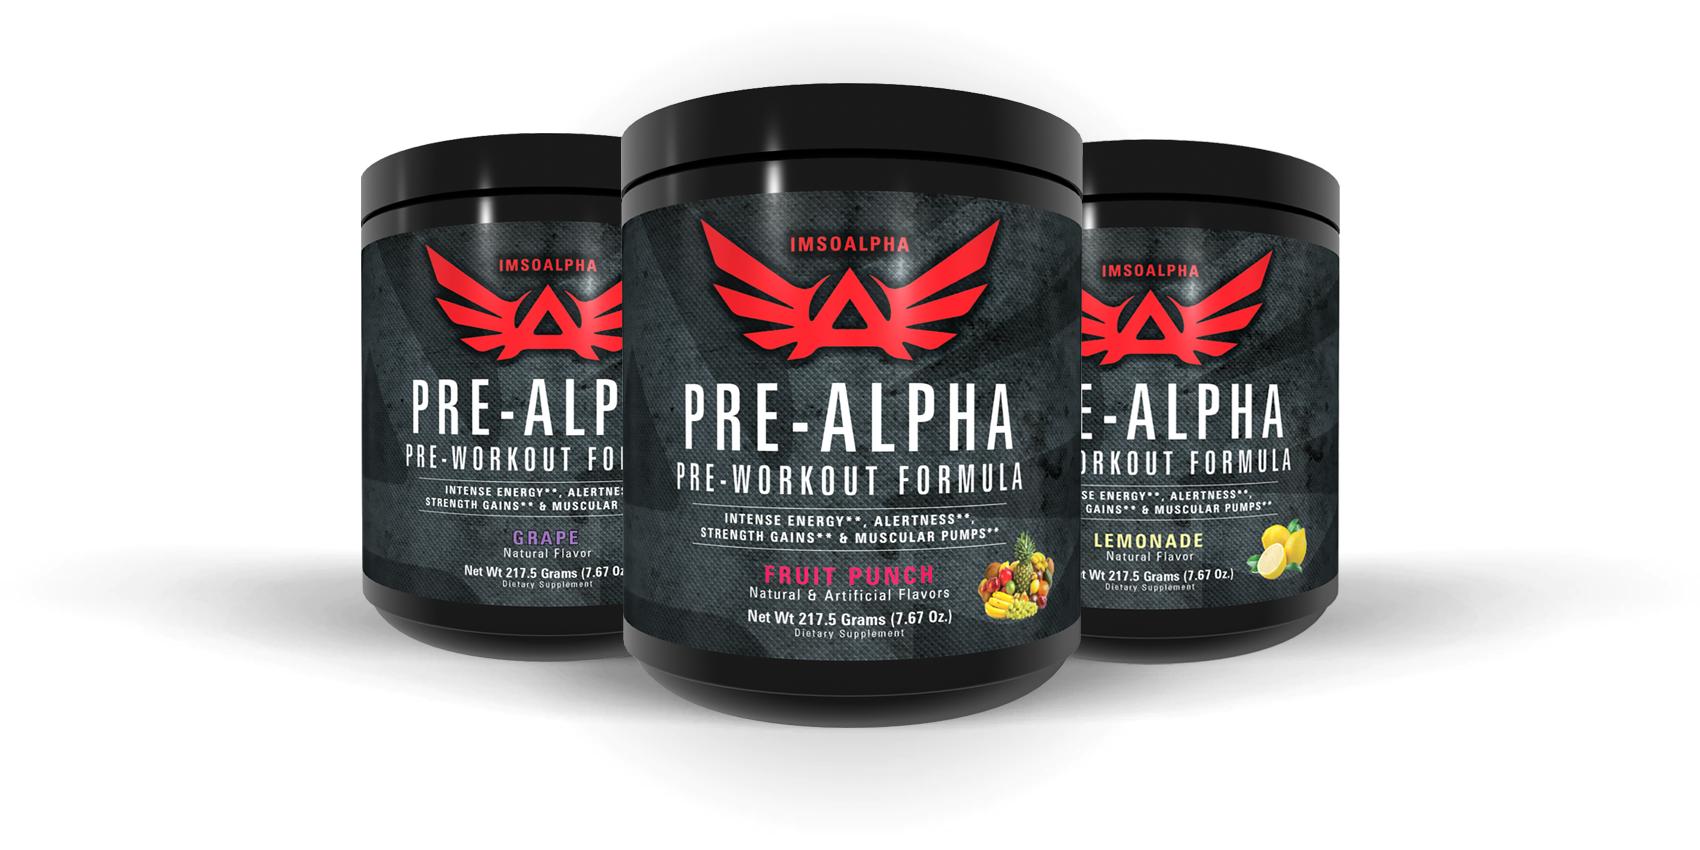 imsoalpha-ix3-preworkout-3-flavors.png